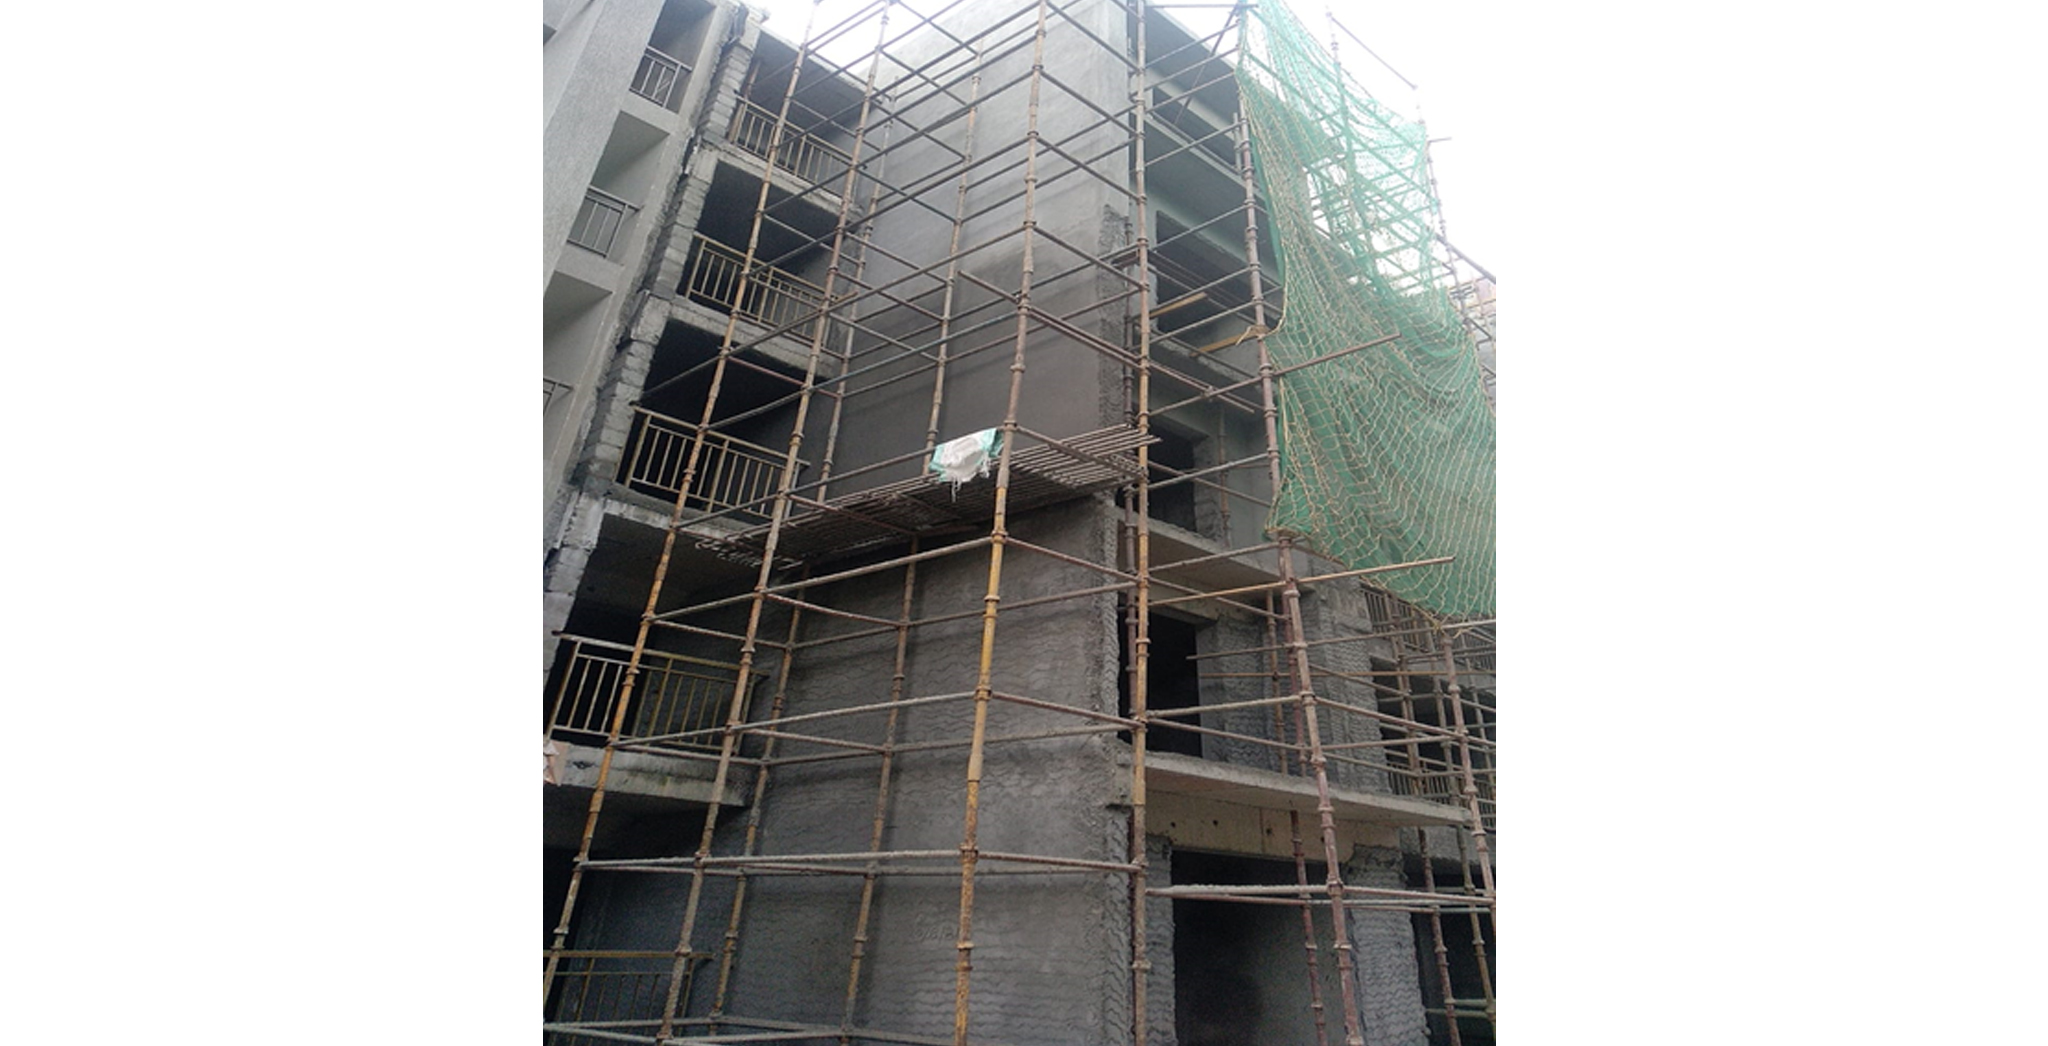 Aug 2021 - D Block : North Elevation External Plastering Work in progress